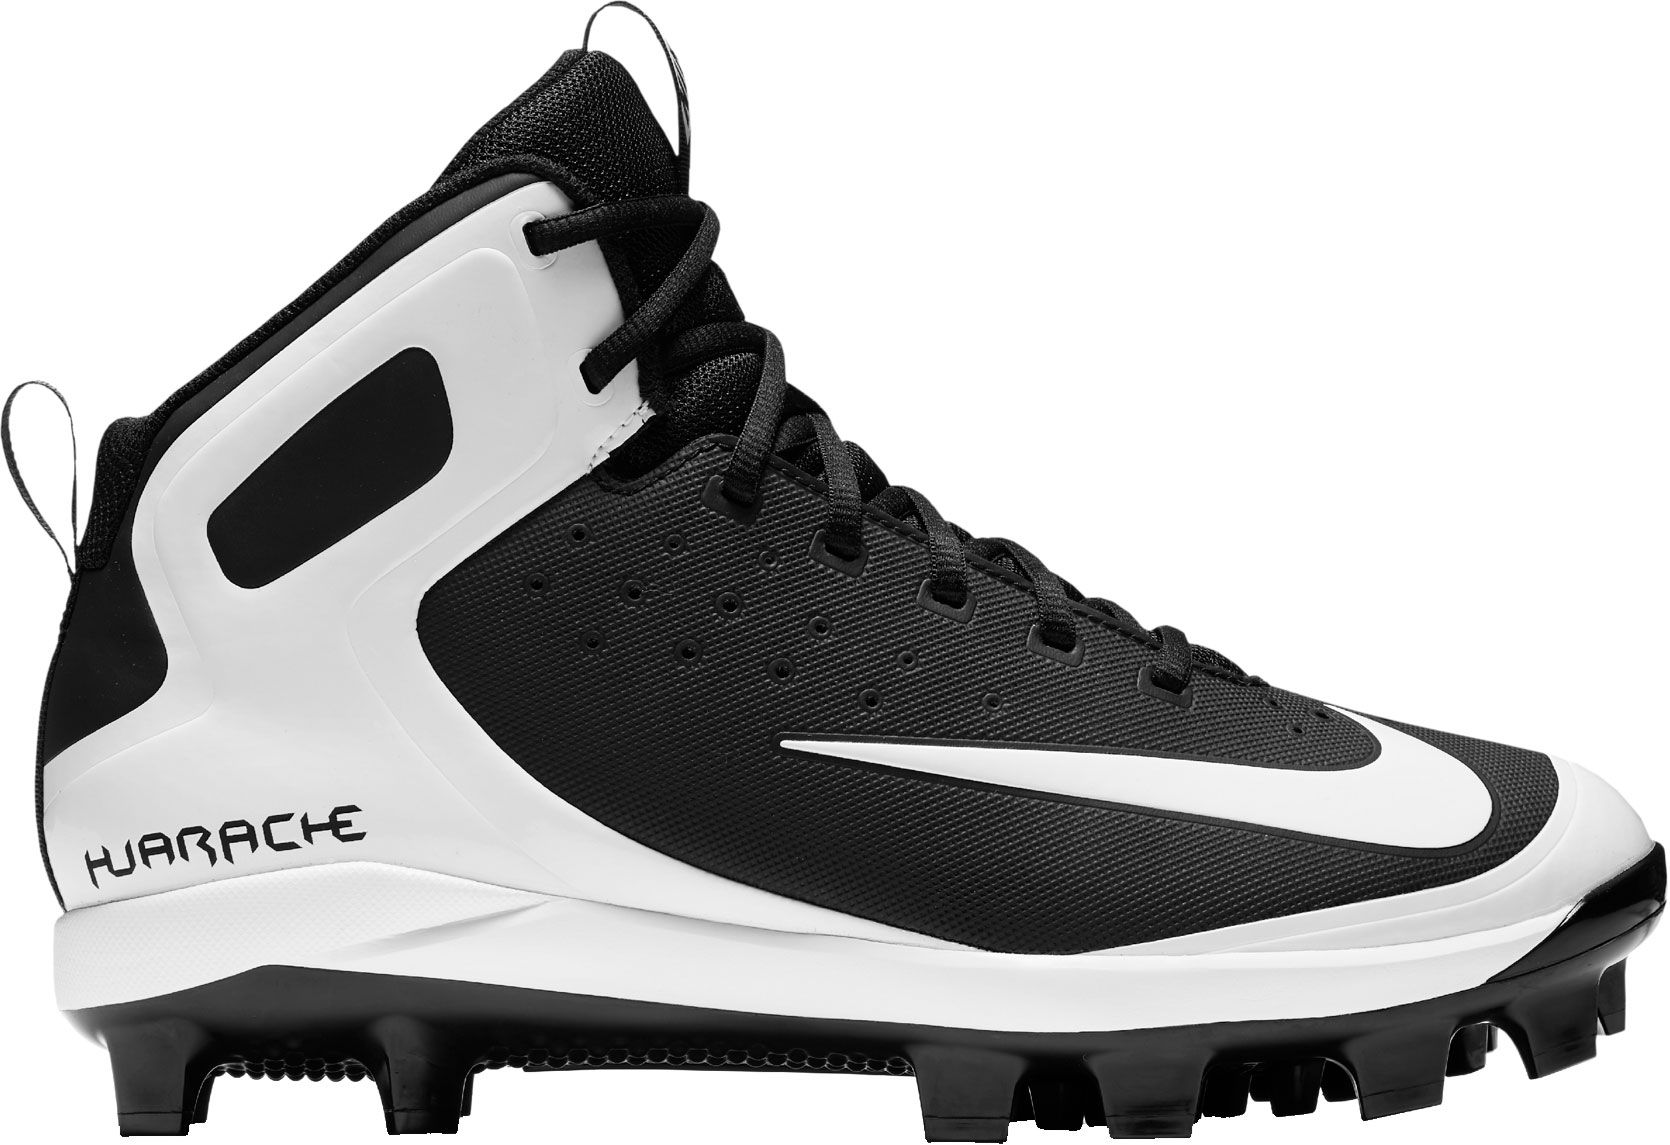 Nike Huarache Pro De Metal Béisbol Taco De Pescado Blanco En Bahamas yPjF454m